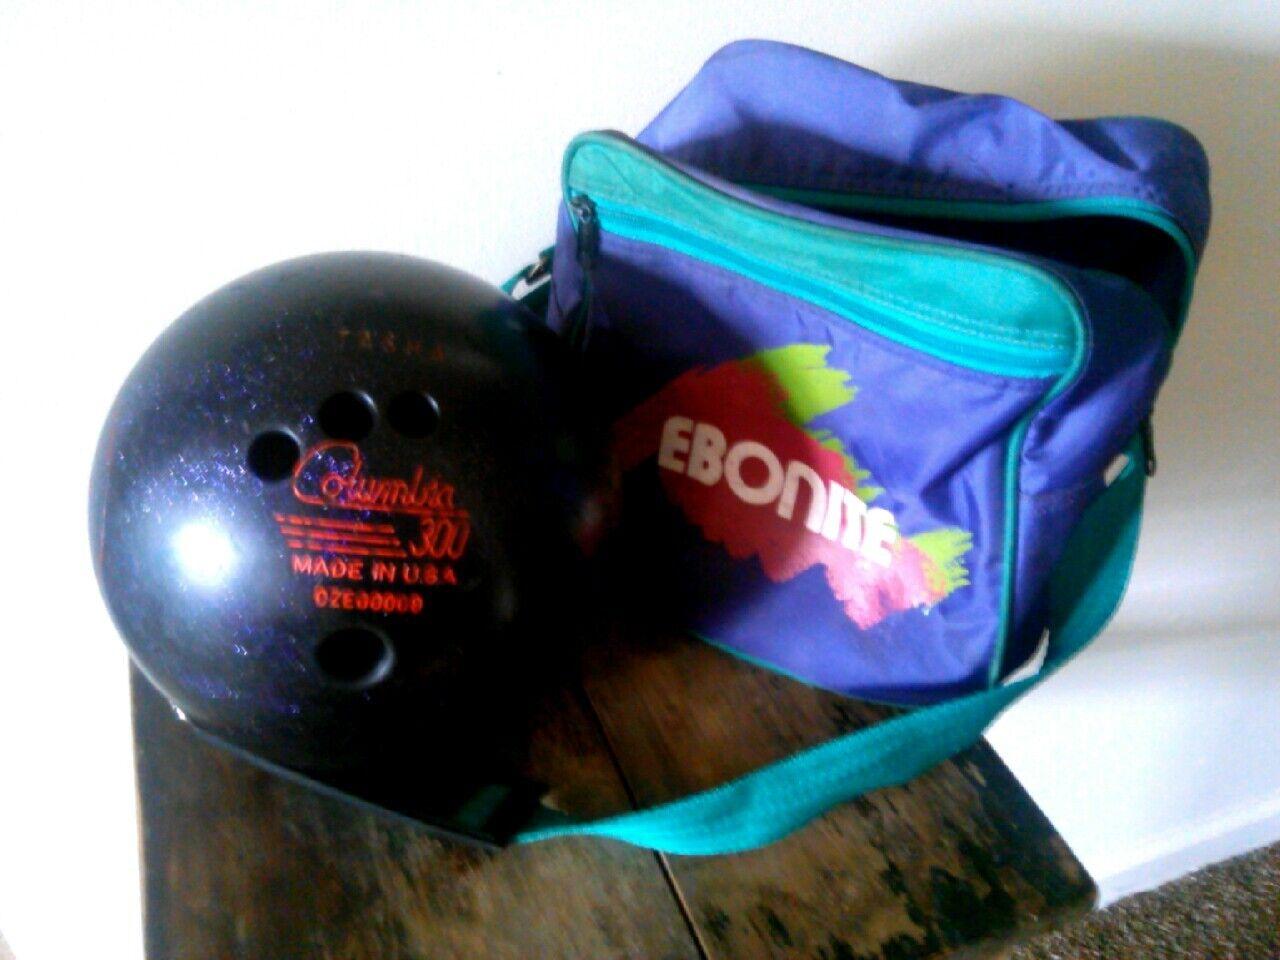 Vtg Purple Sparkle Columbia 300 White Dot Bowling Ball OZE00009 Tasha 8.5